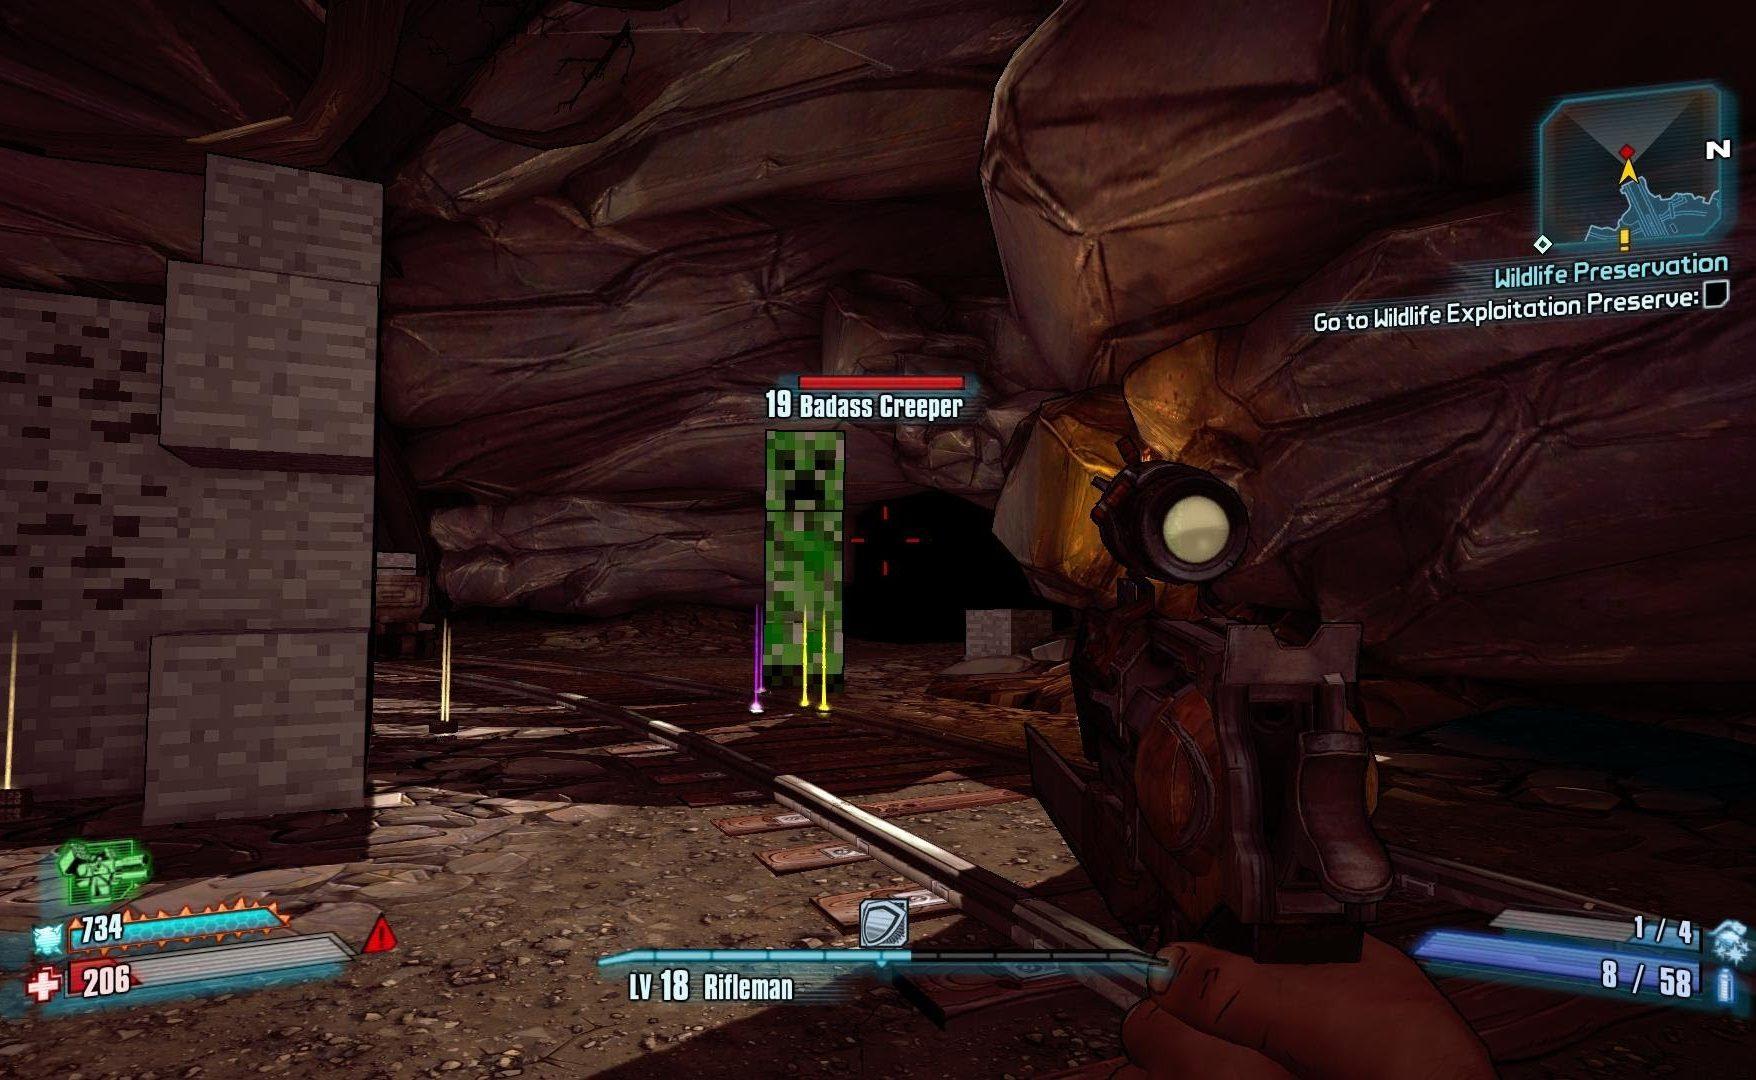 easter eggs article borderlands 2 minecraft e1605110188934 20 Hidden Levels in Video Games